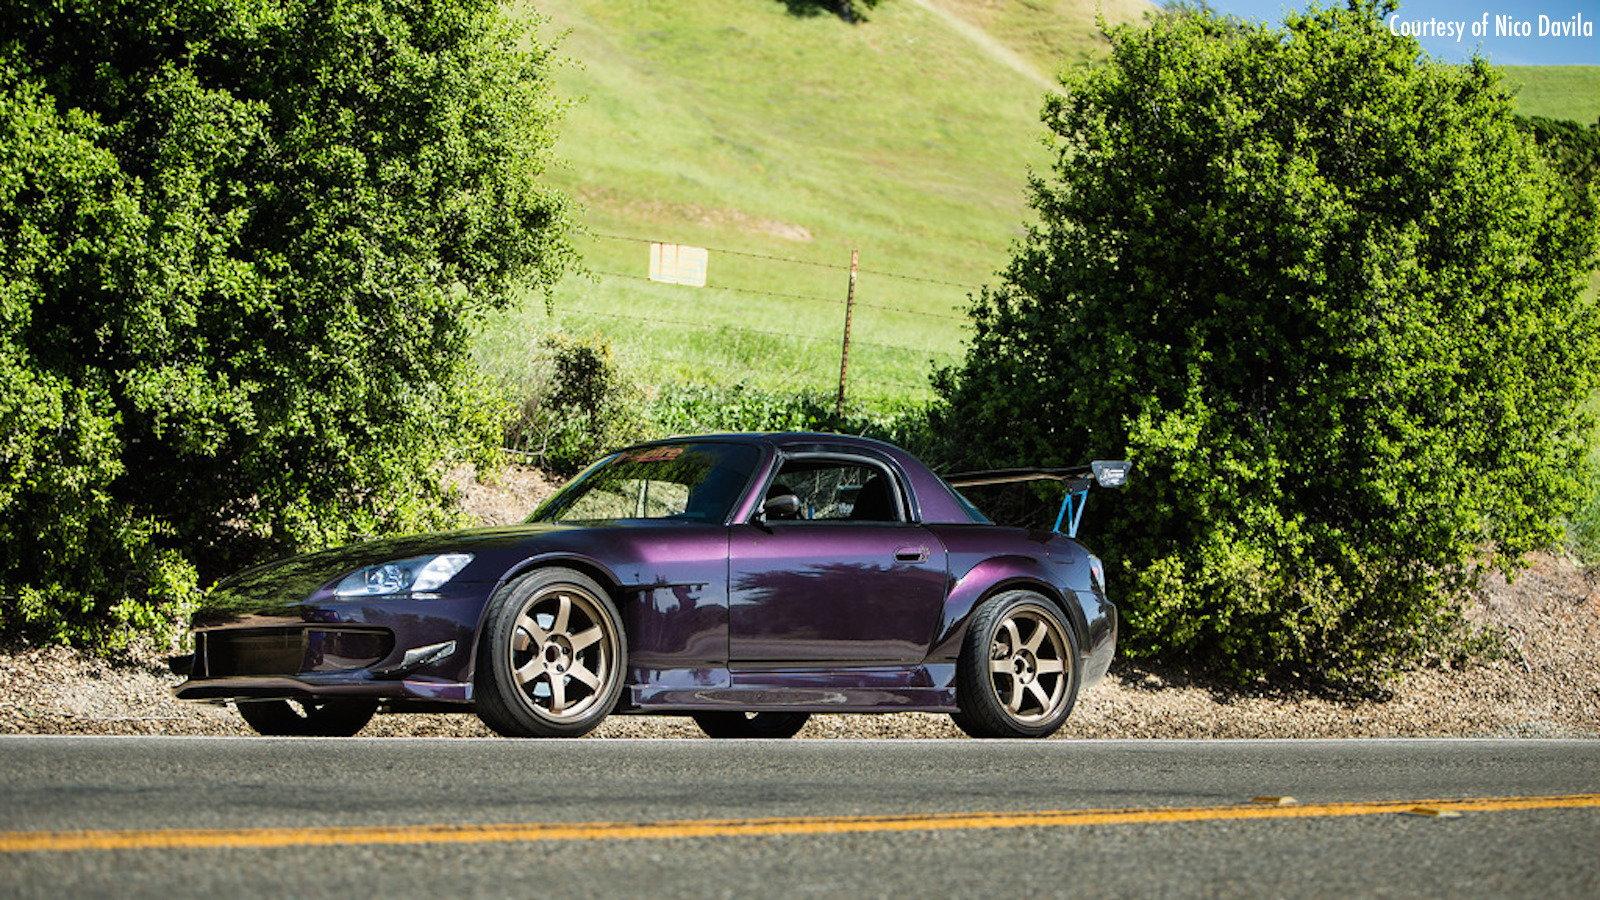 Neeekd's GTR Purple